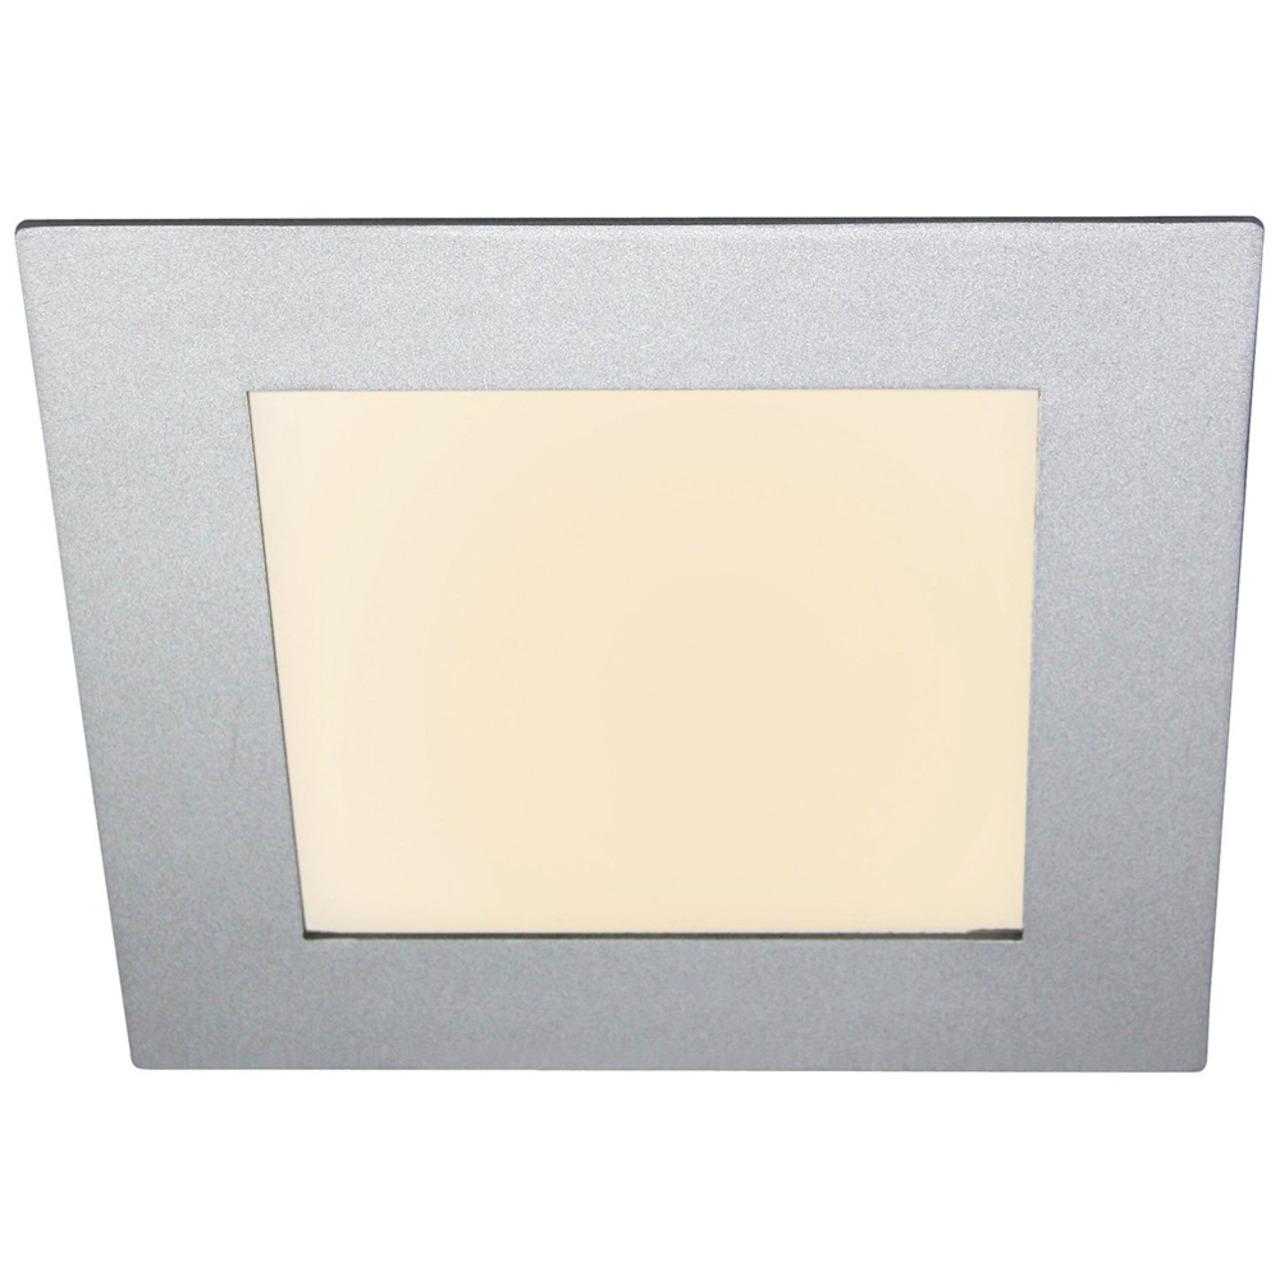 HEITRONIC 11-W-LED-Panel Toulouse- Einbaumass 170x170 mm- Einbautiefe 20 mm- warmweiss- dimmbar- IP44